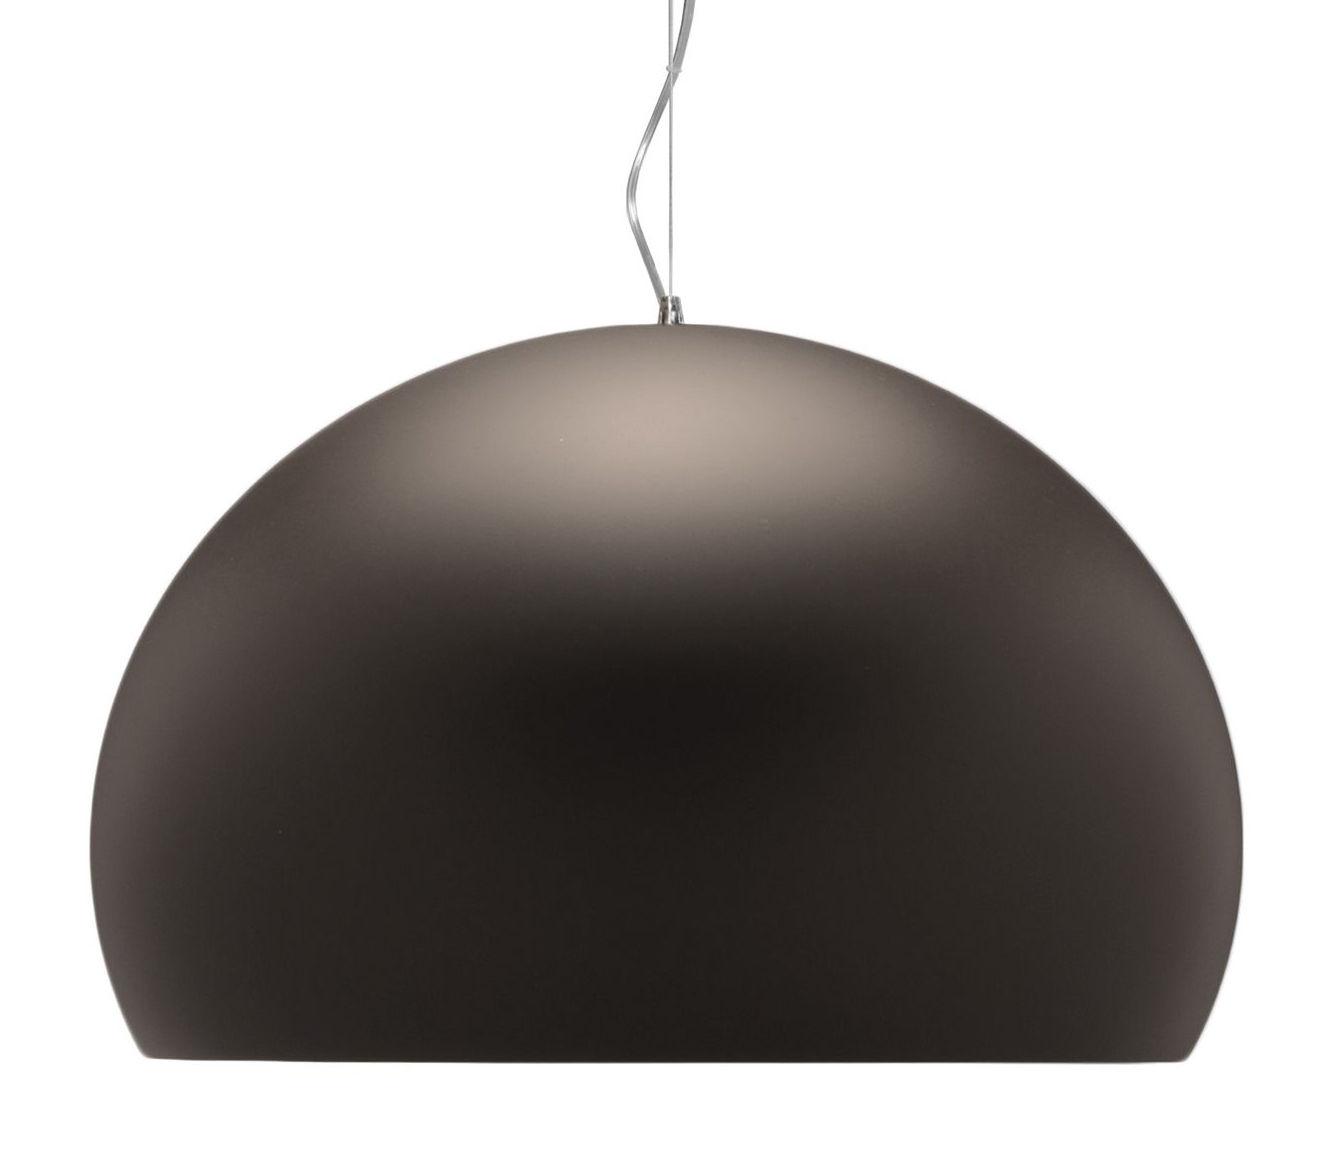 Lampe à suspension FL / Y - Ø 52 cm Peinture marron mat Kartell Ferruccio Laviani 1